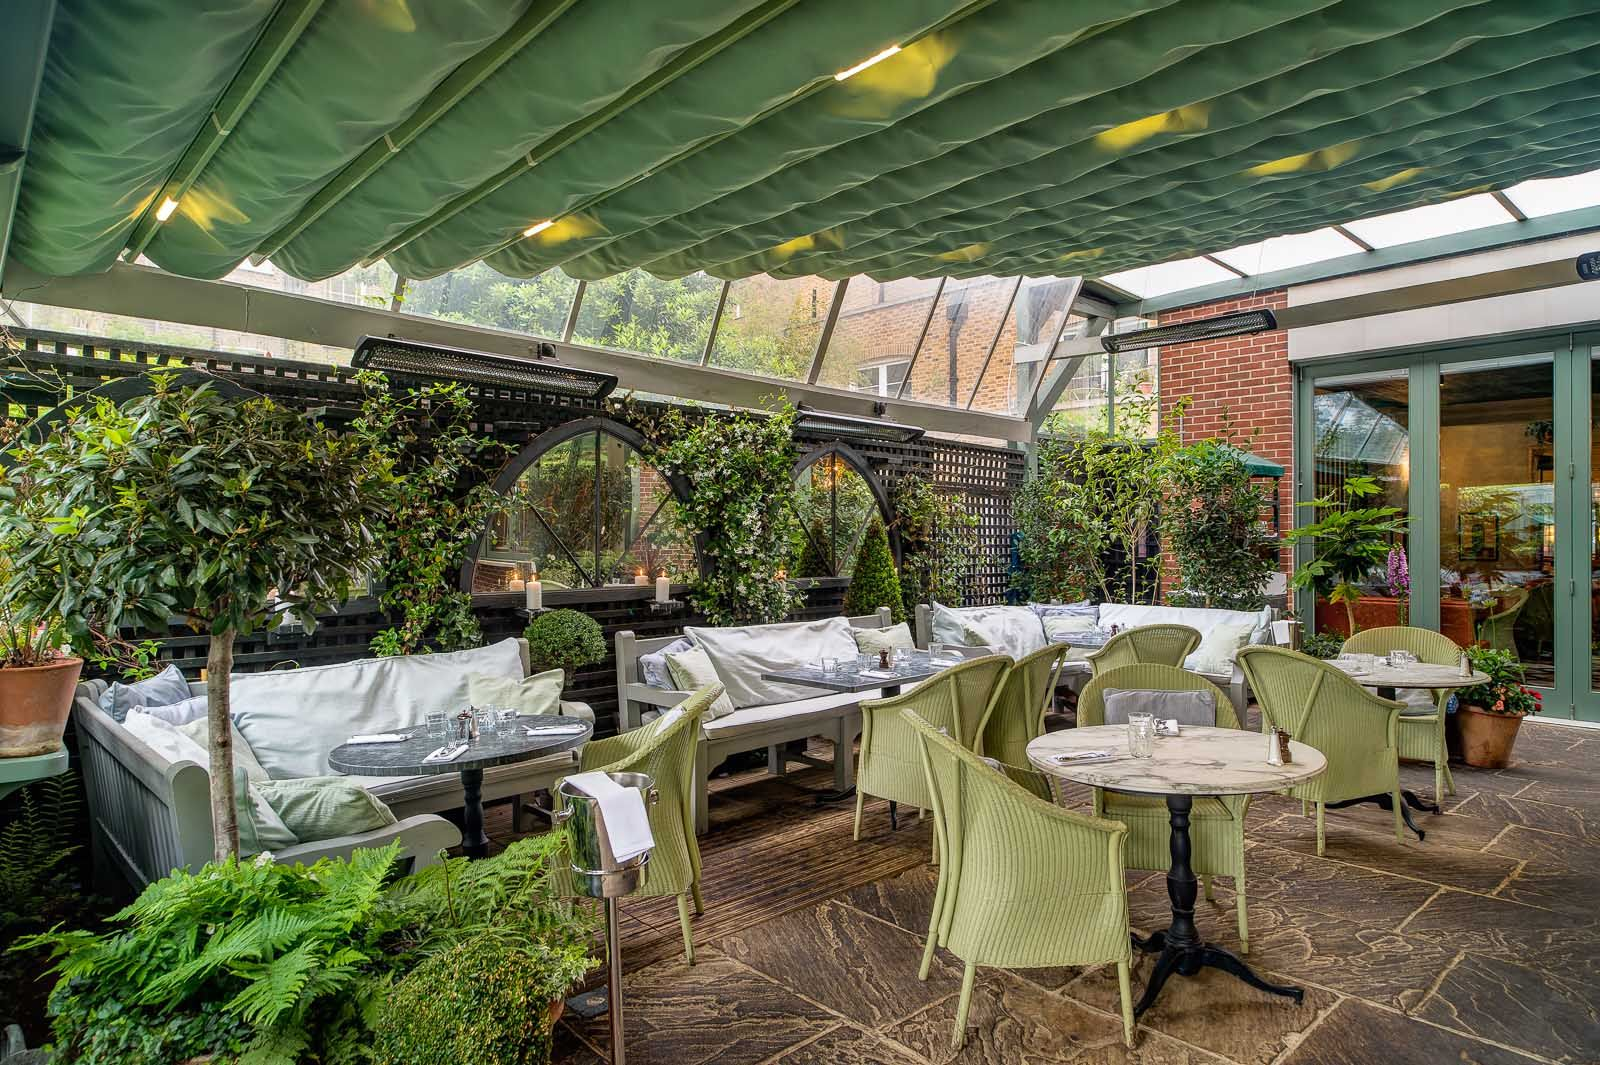 The Ivy Chelsea Garden Chelsea garden, The ivy chelsea